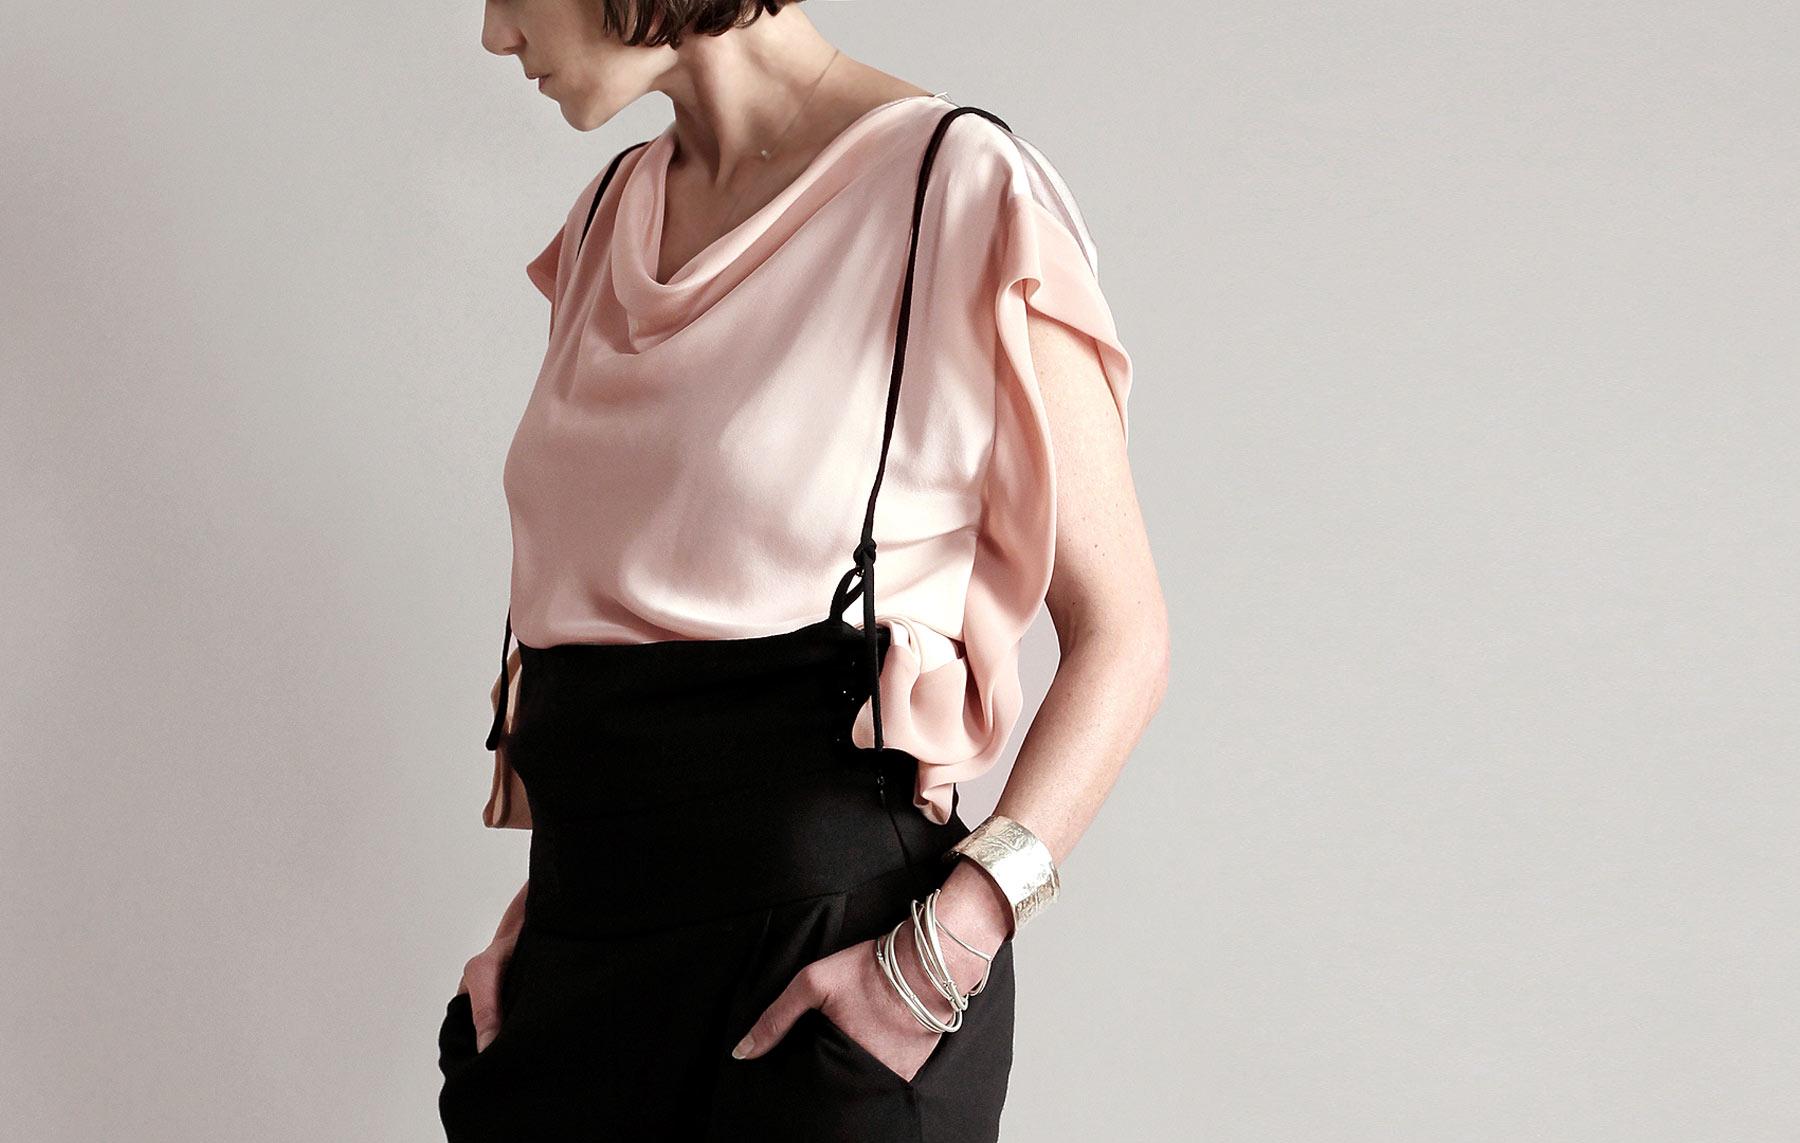 geld-und-mode-paula-immich-rosa-top